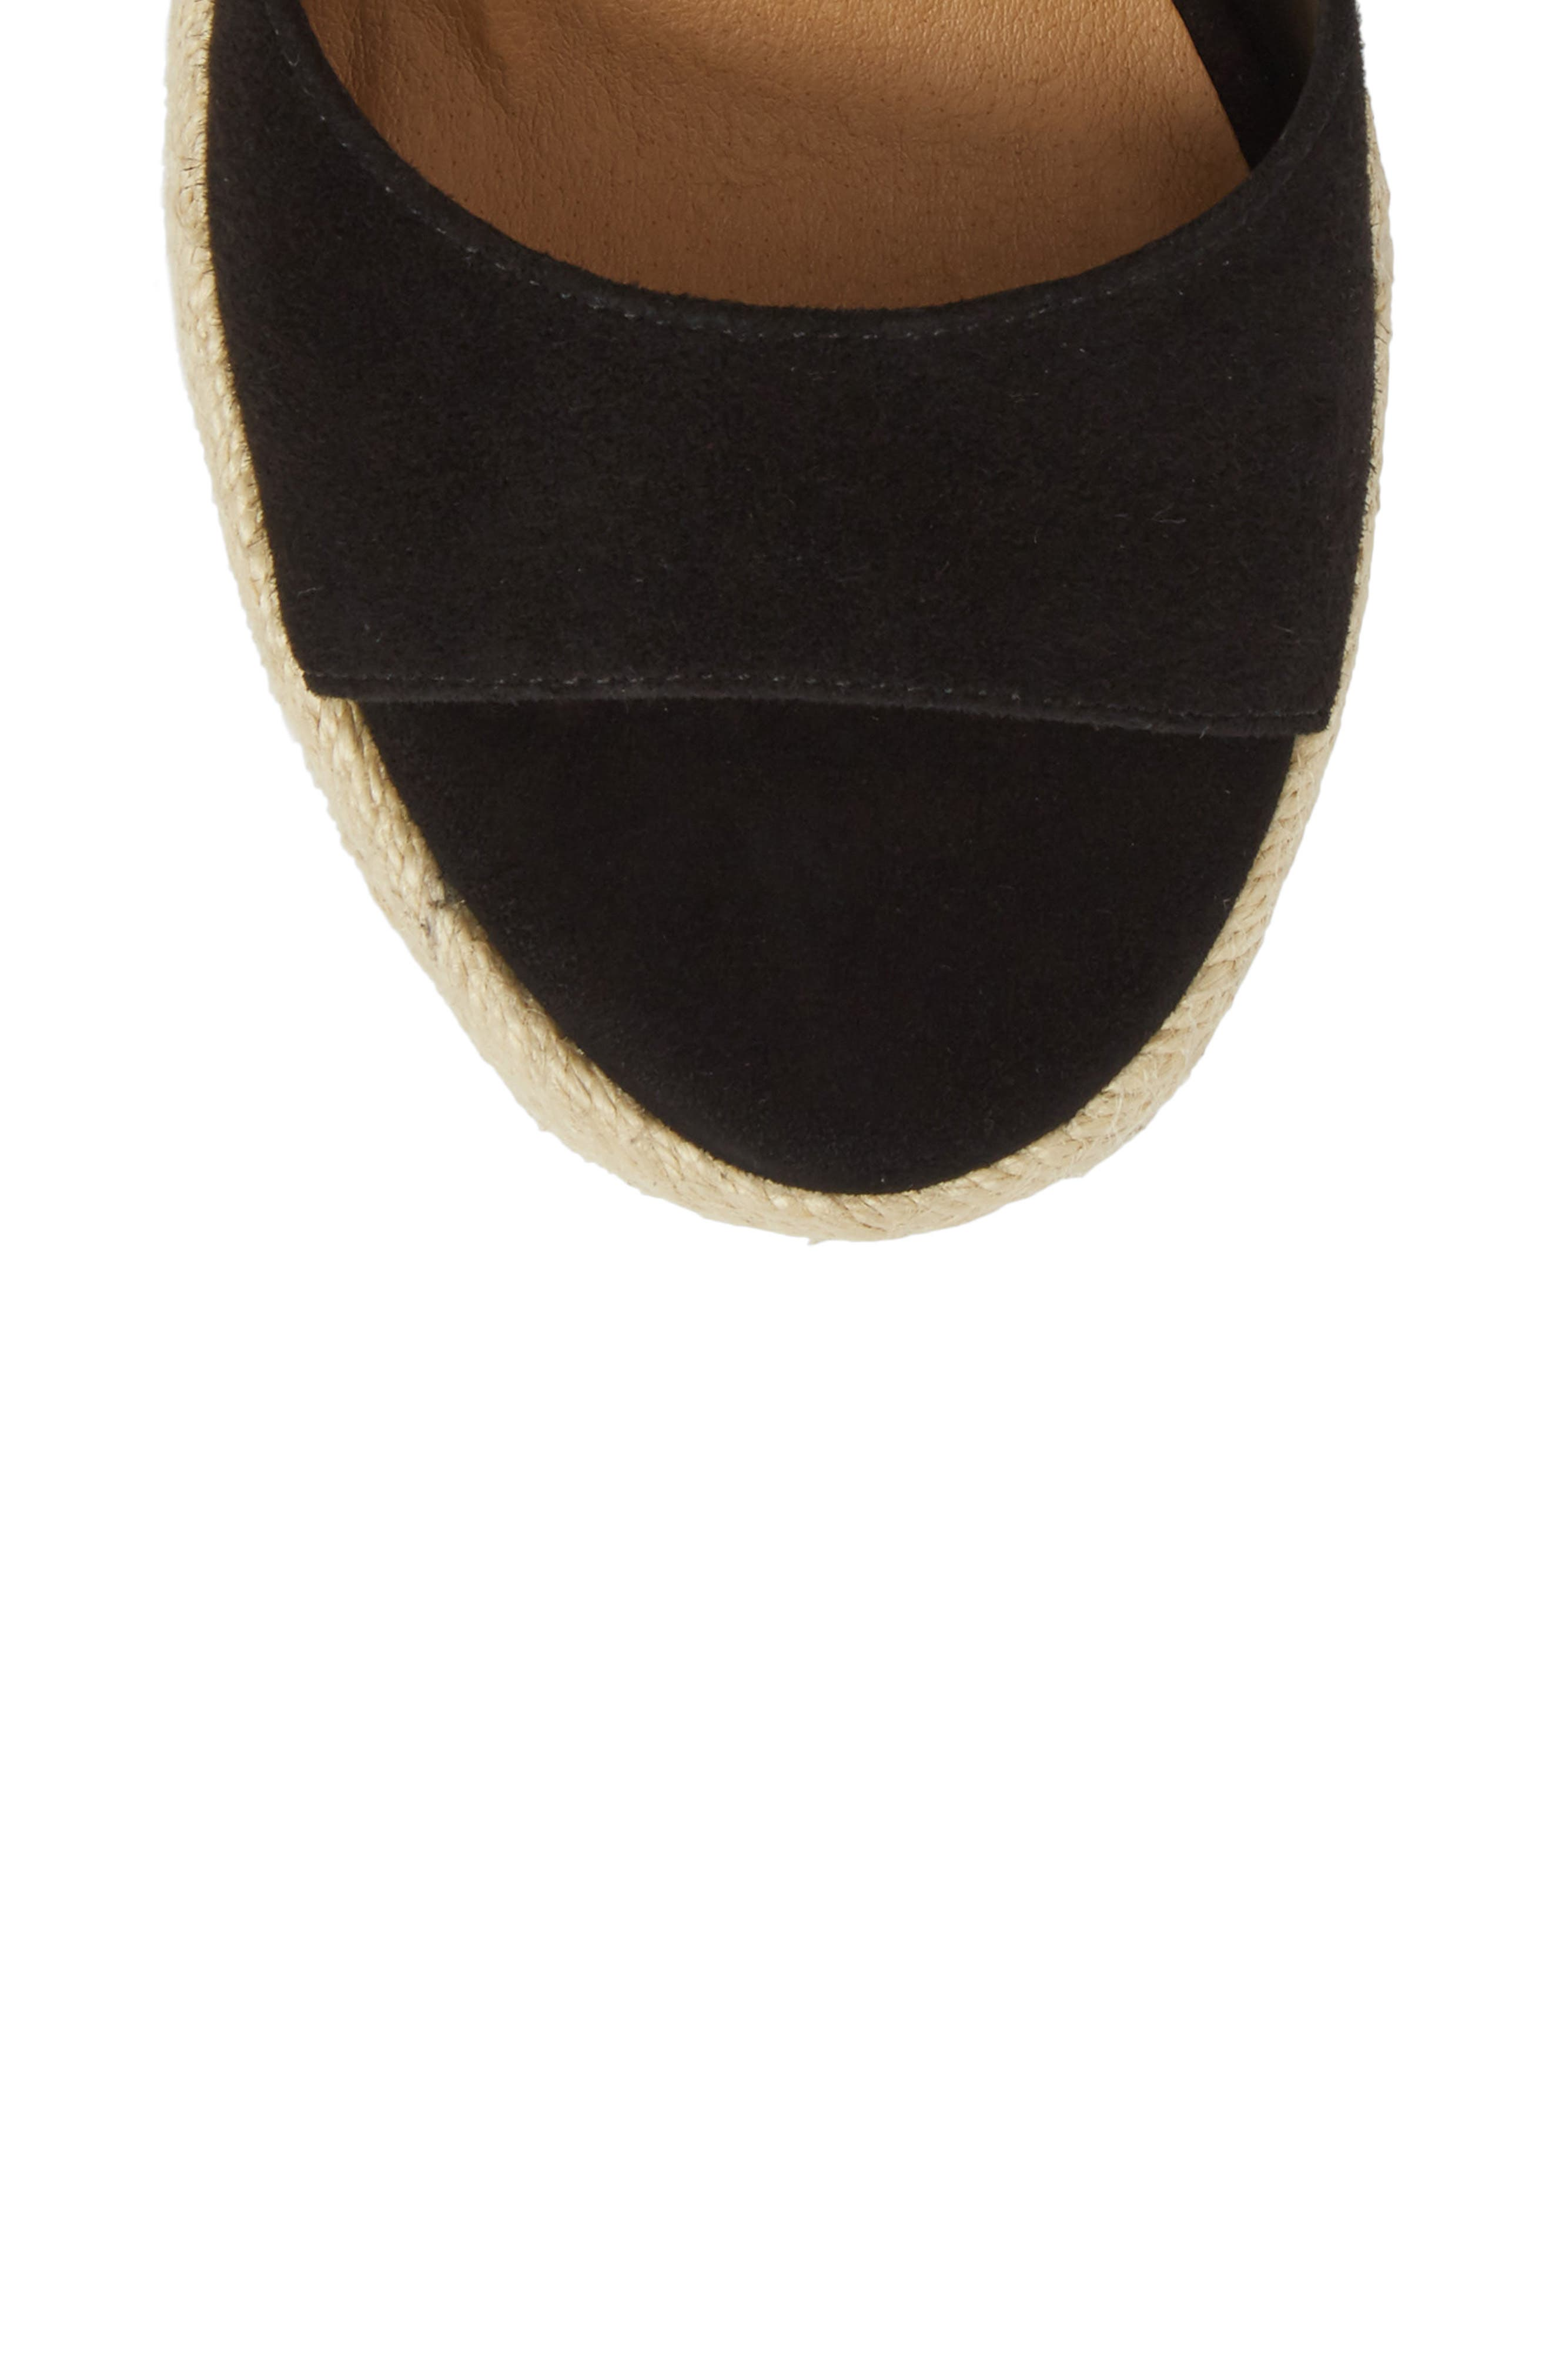 Barca Espadrille Wedge Sandal,                             Alternate thumbnail 5, color,                             BLACK SUEDE